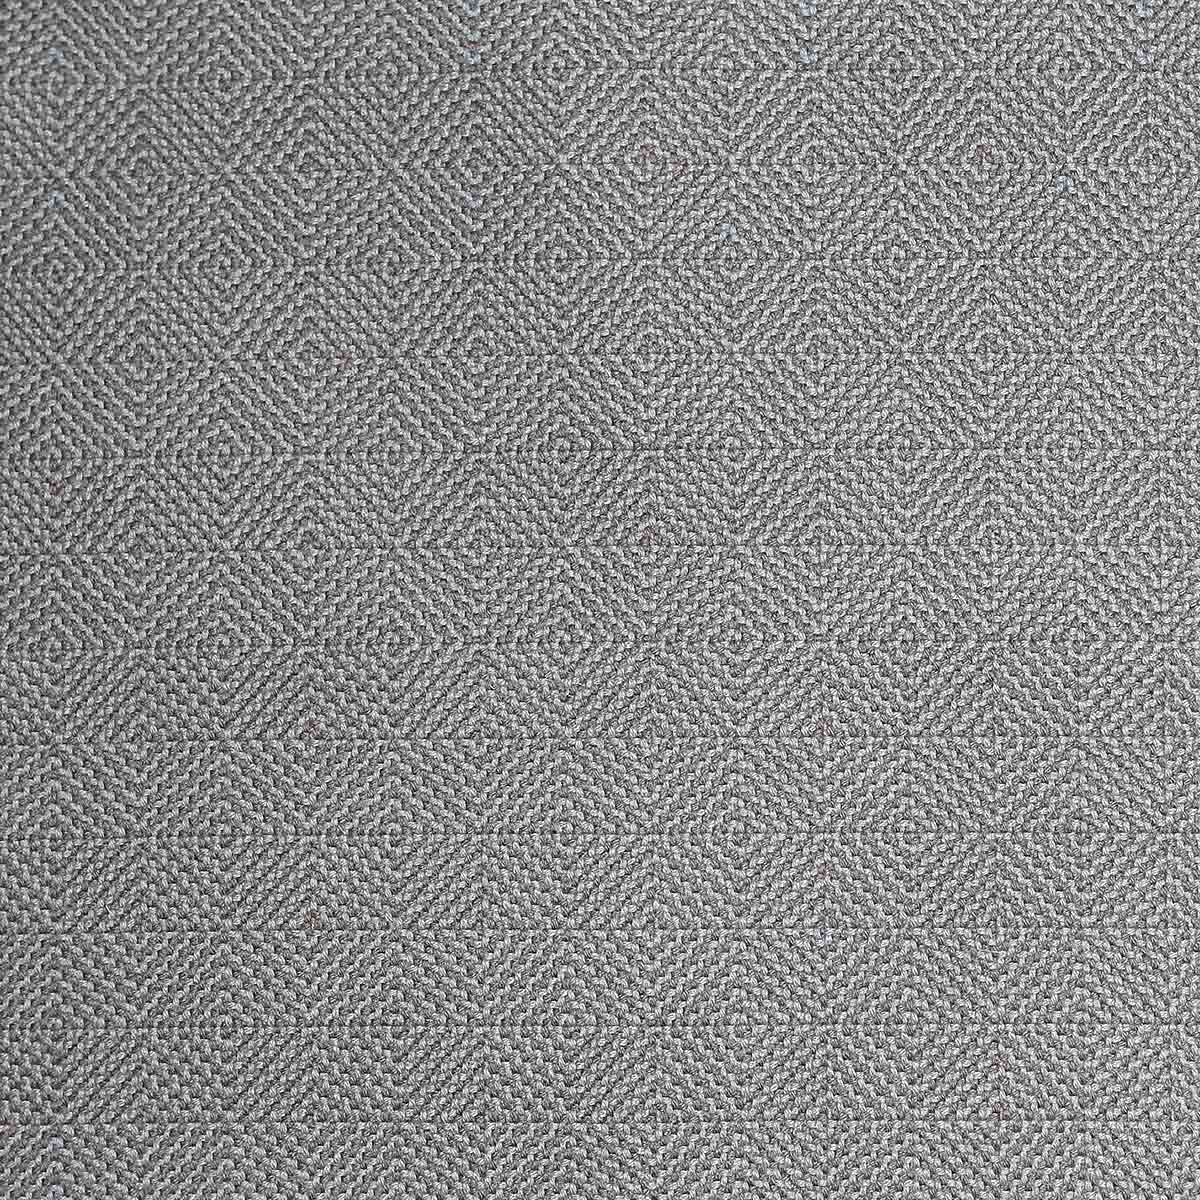 Ozlins Geometric Carpets Collection Tim Page